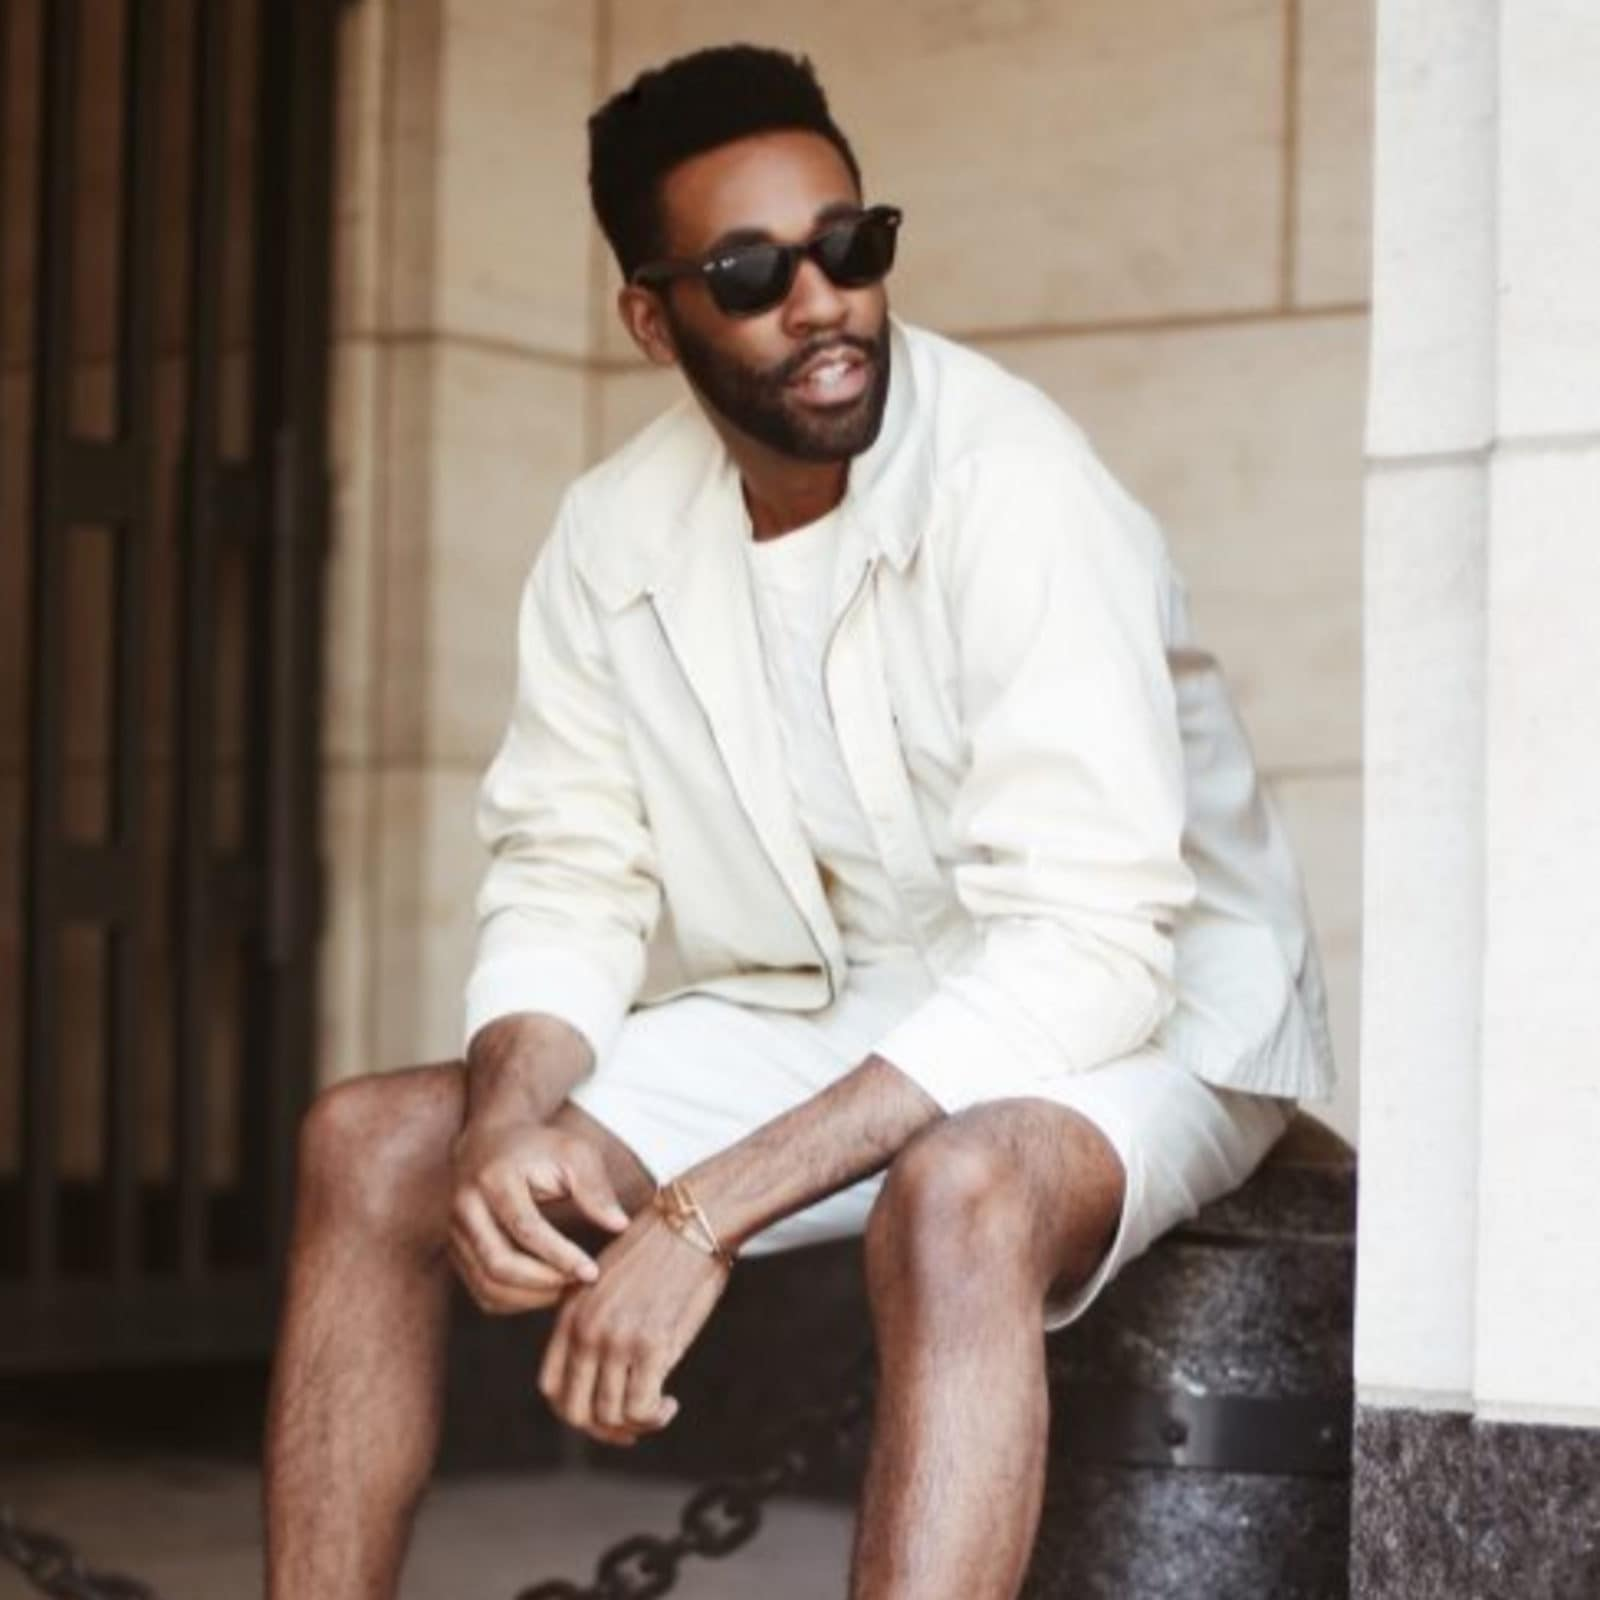 Ryan Clark of @RyanStylesNYC & High Fashion Living